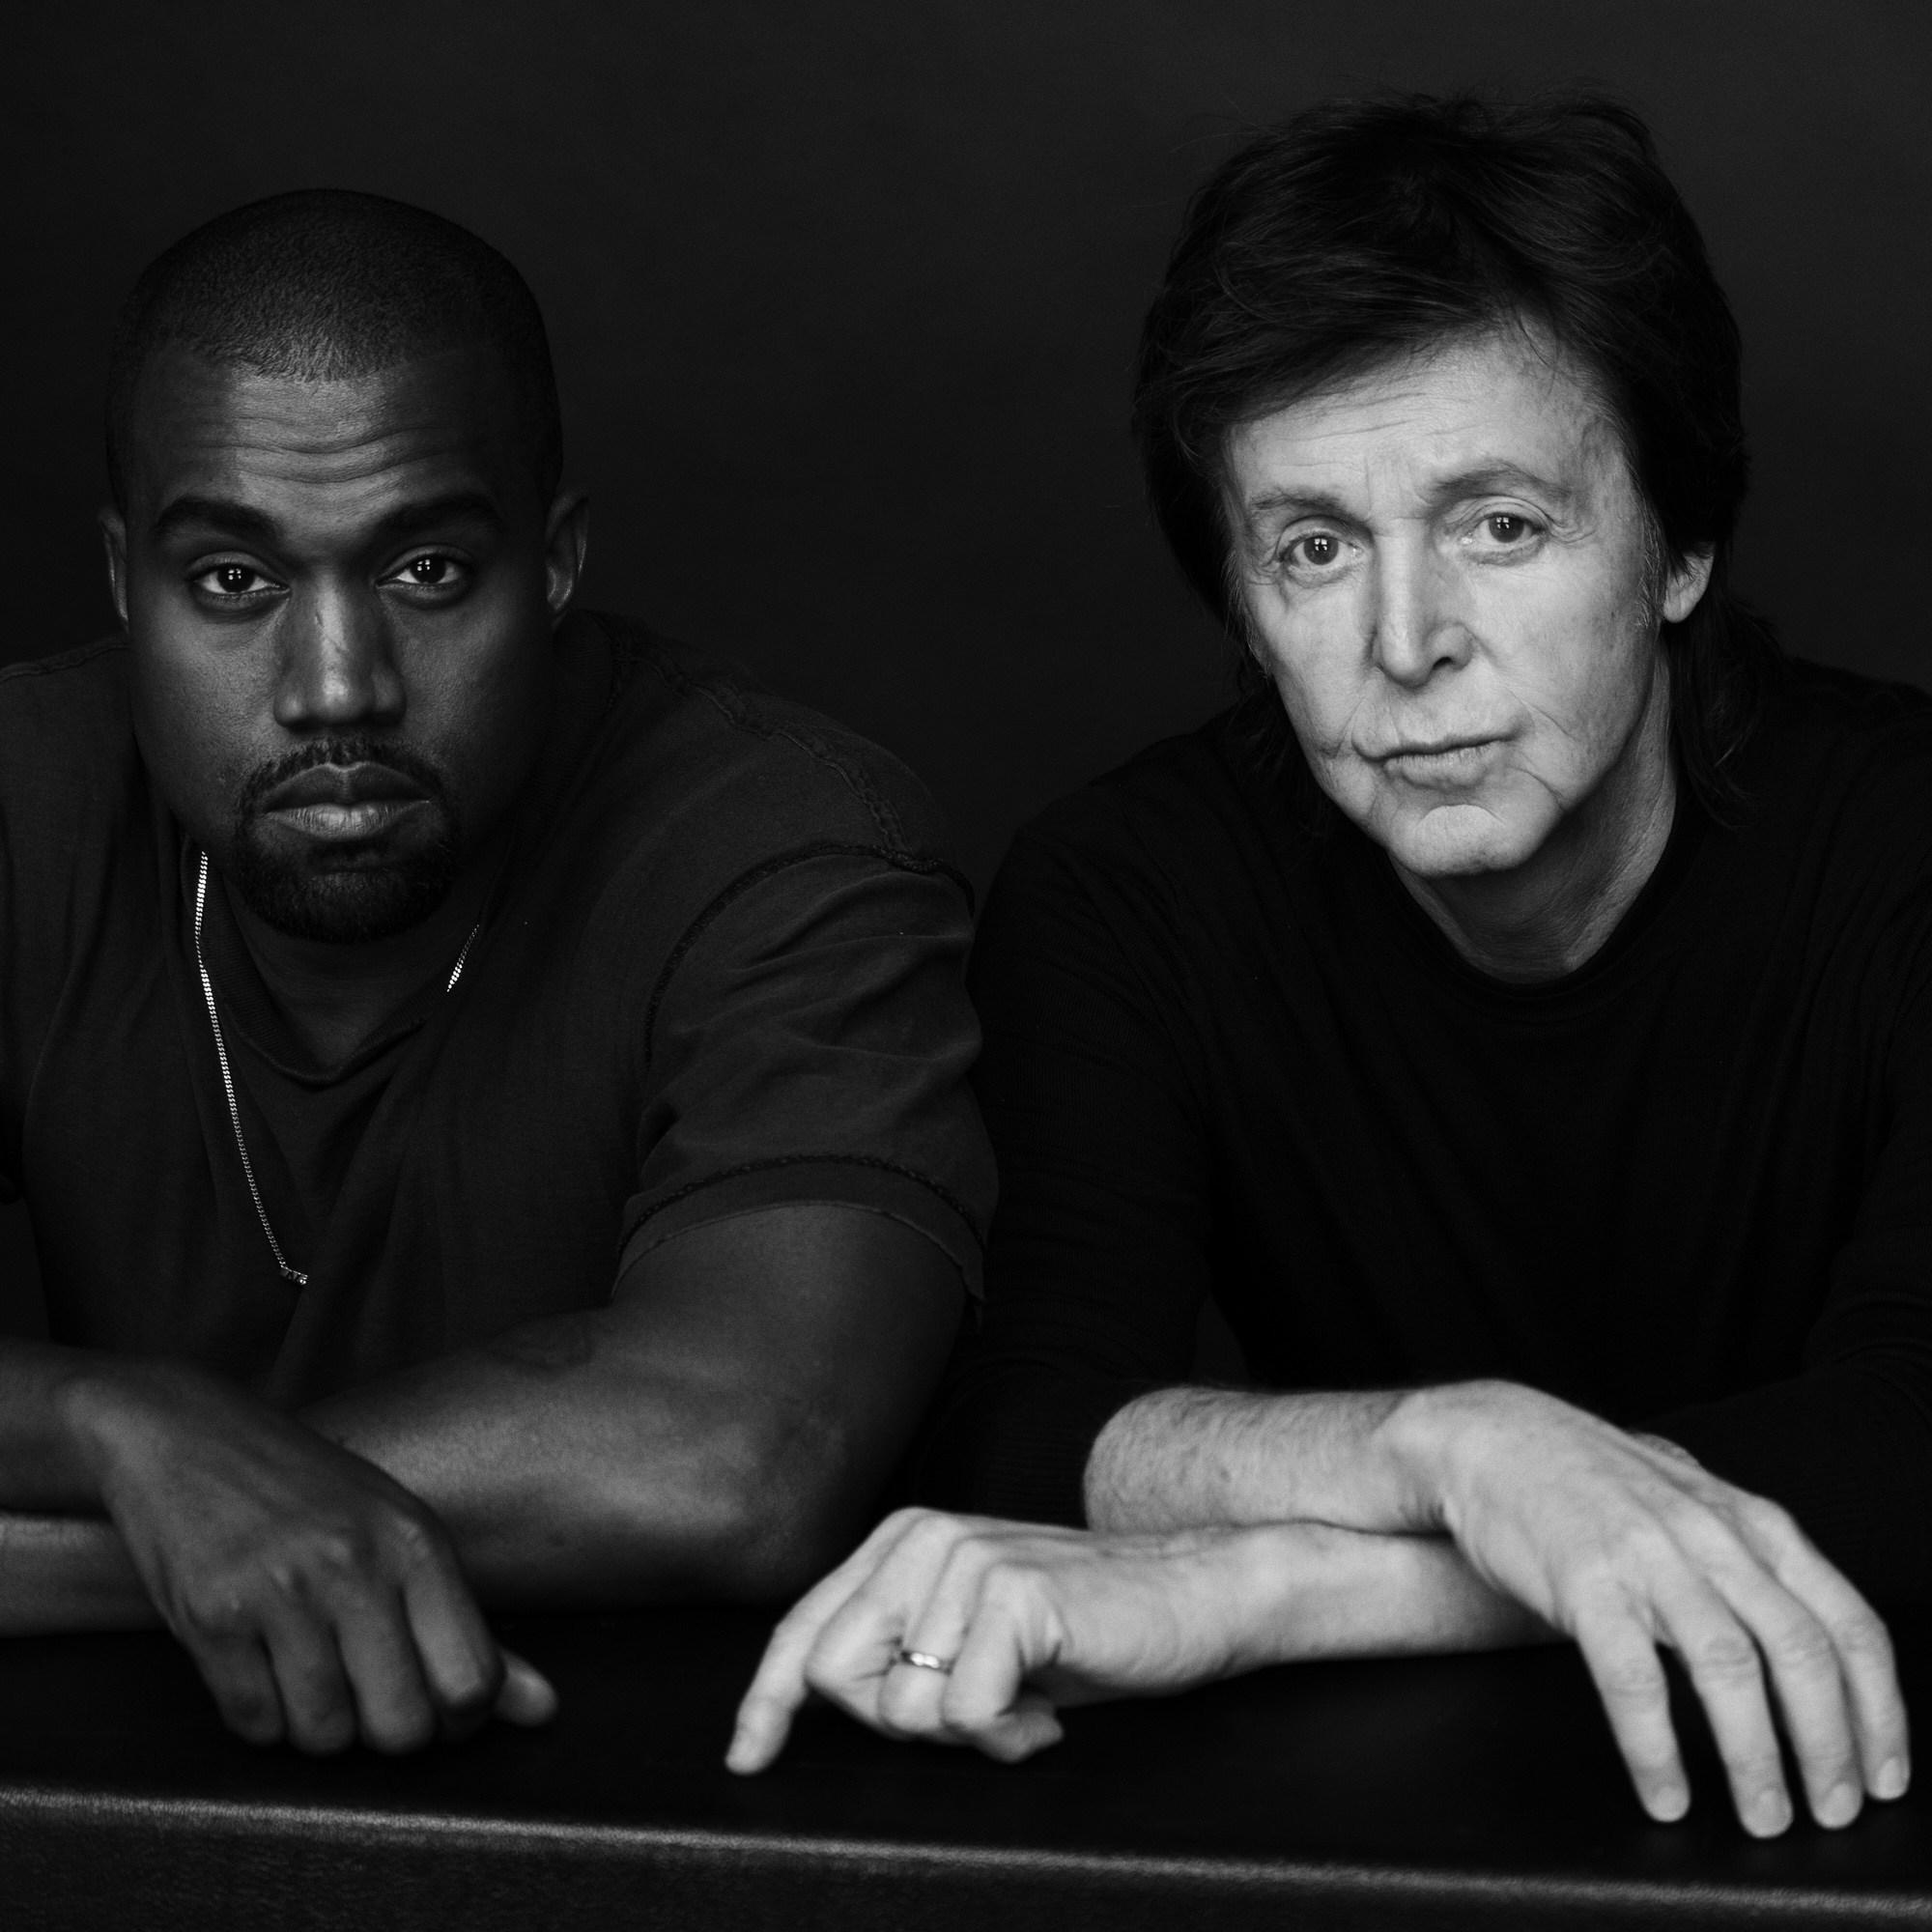 fa Kanye West hanno un grande penenudo teen pix